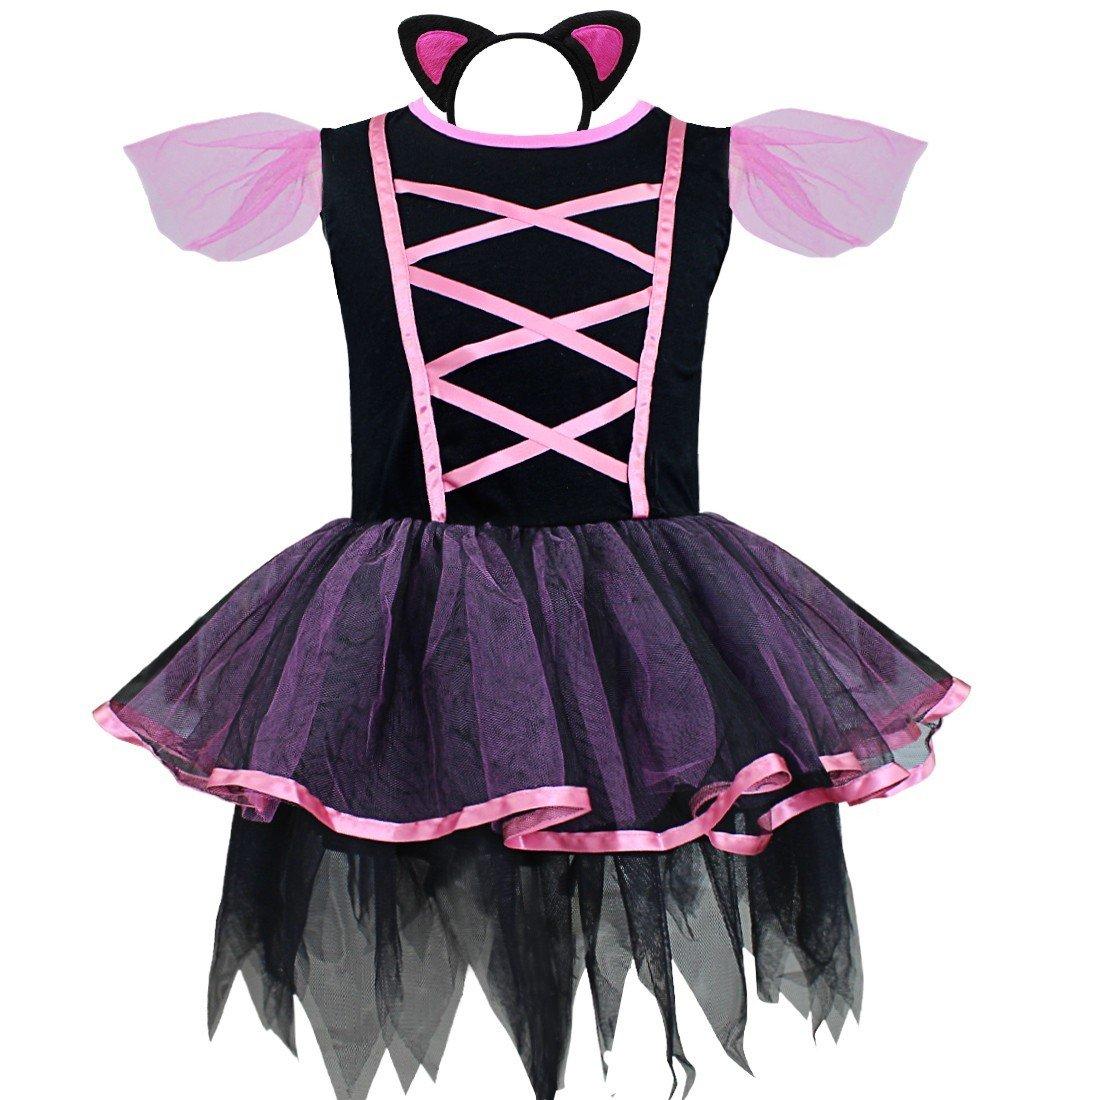 Freebily Disfraz de Carnaval para Niña Vestido Infantil de Fiesta ...